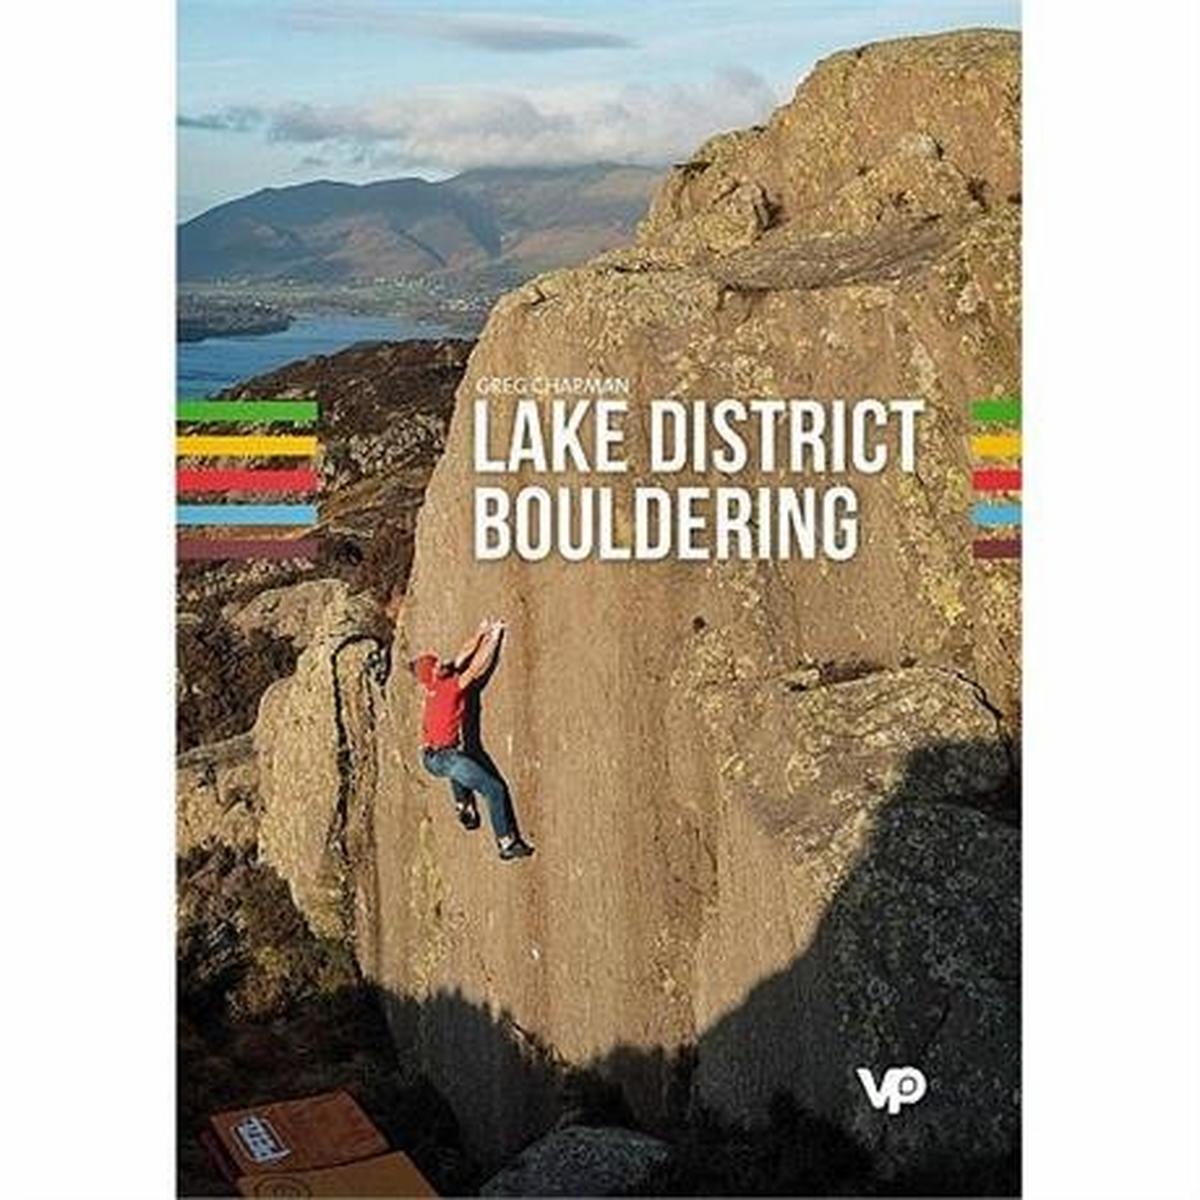 Vertebrate Publishing Climbing Guide Book: Lake District Bouldering Lakesbloc